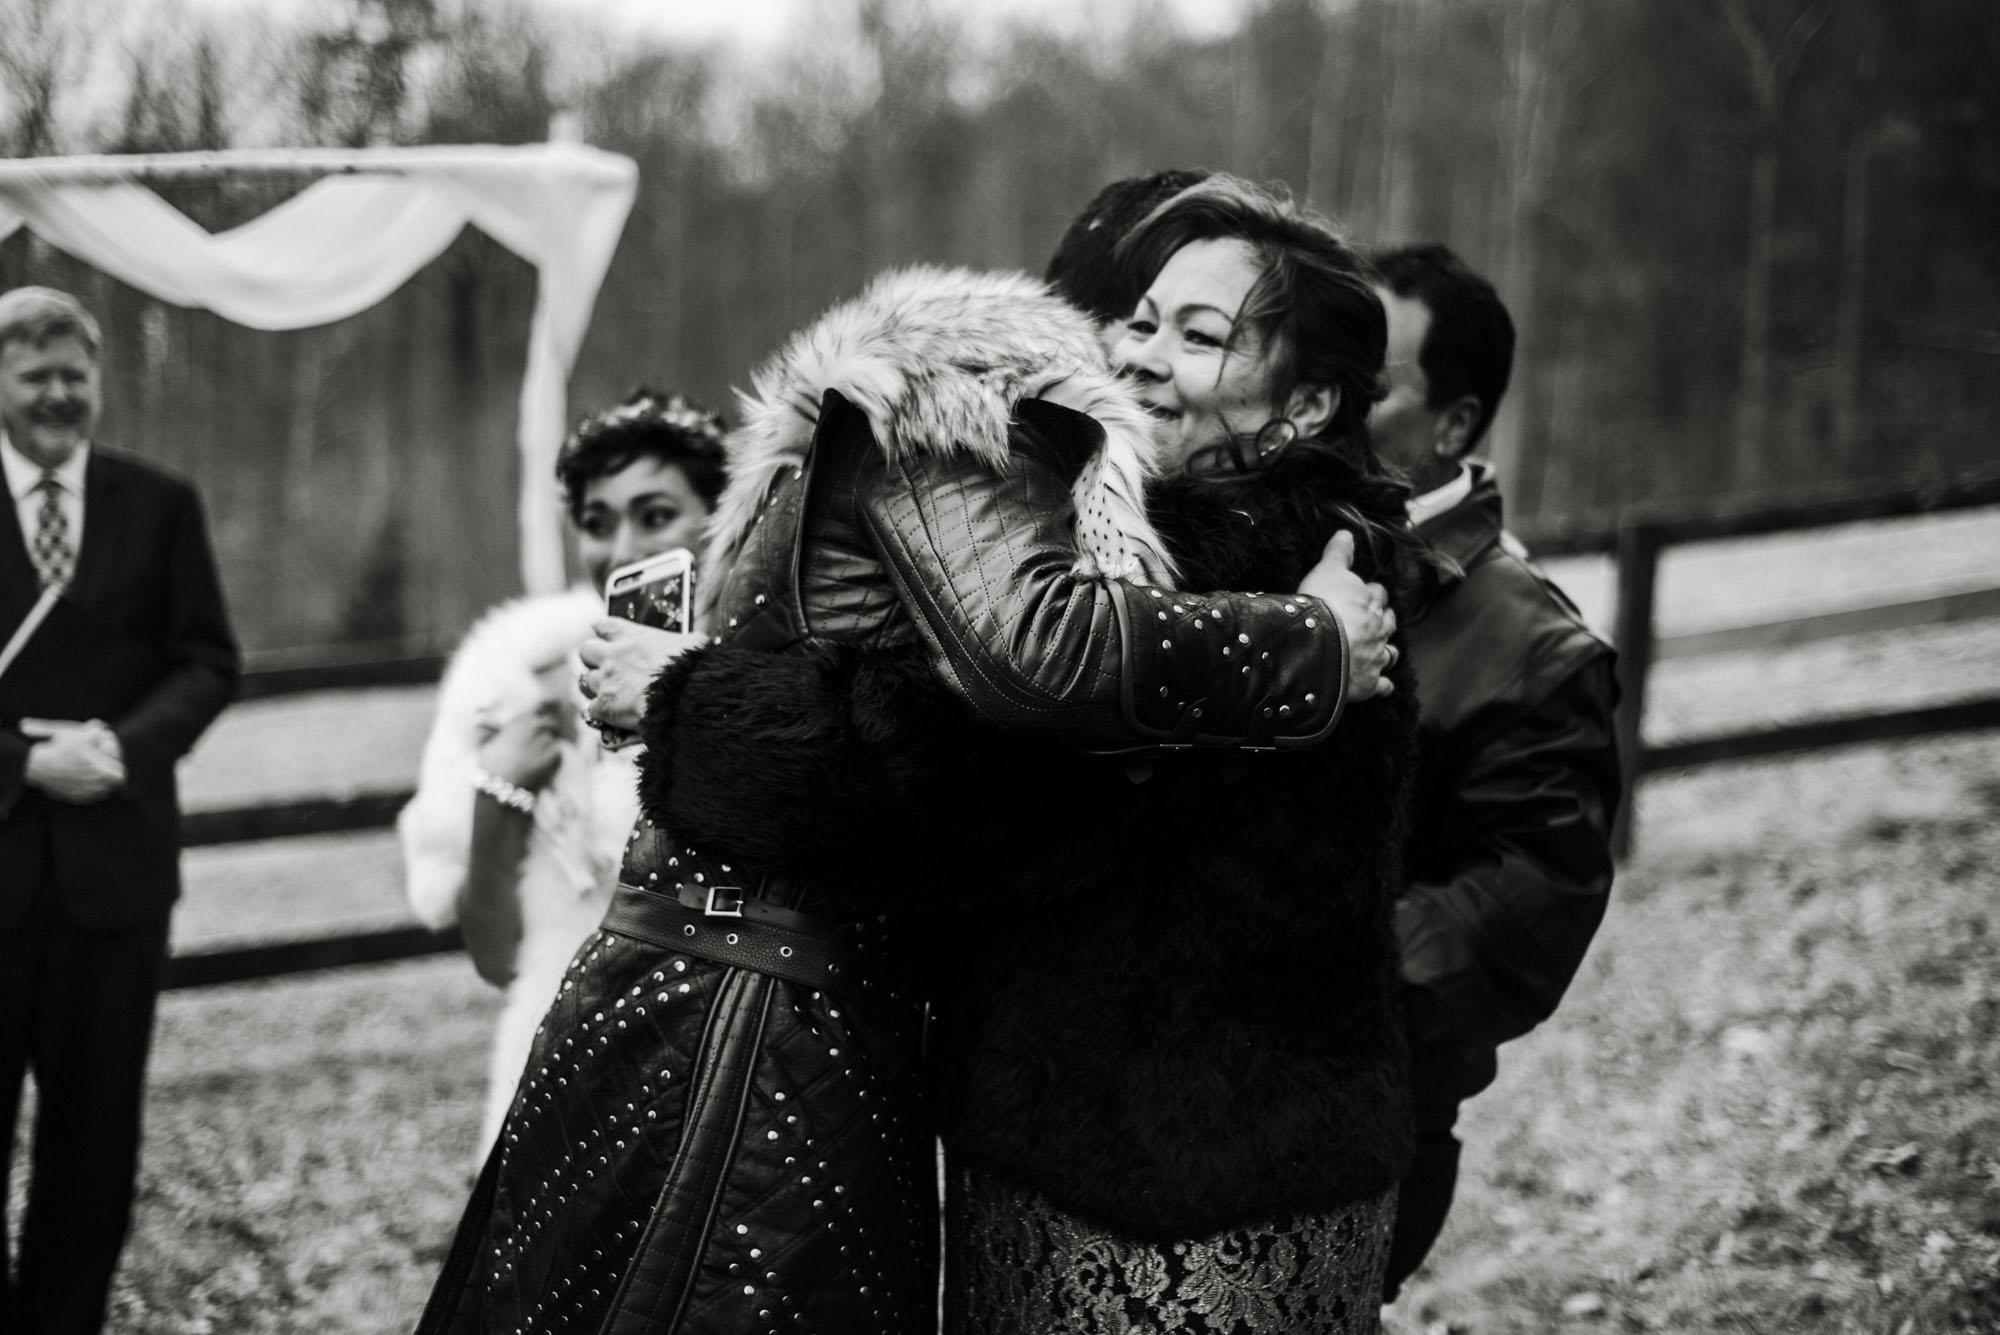 Game of Thrones Elopement - Winter Elopement - Shenandoah National Park Elopement Photographer - Virginia Adventure Photographer - Blue Ridge Parkway Elopement Photographer_41.jpg